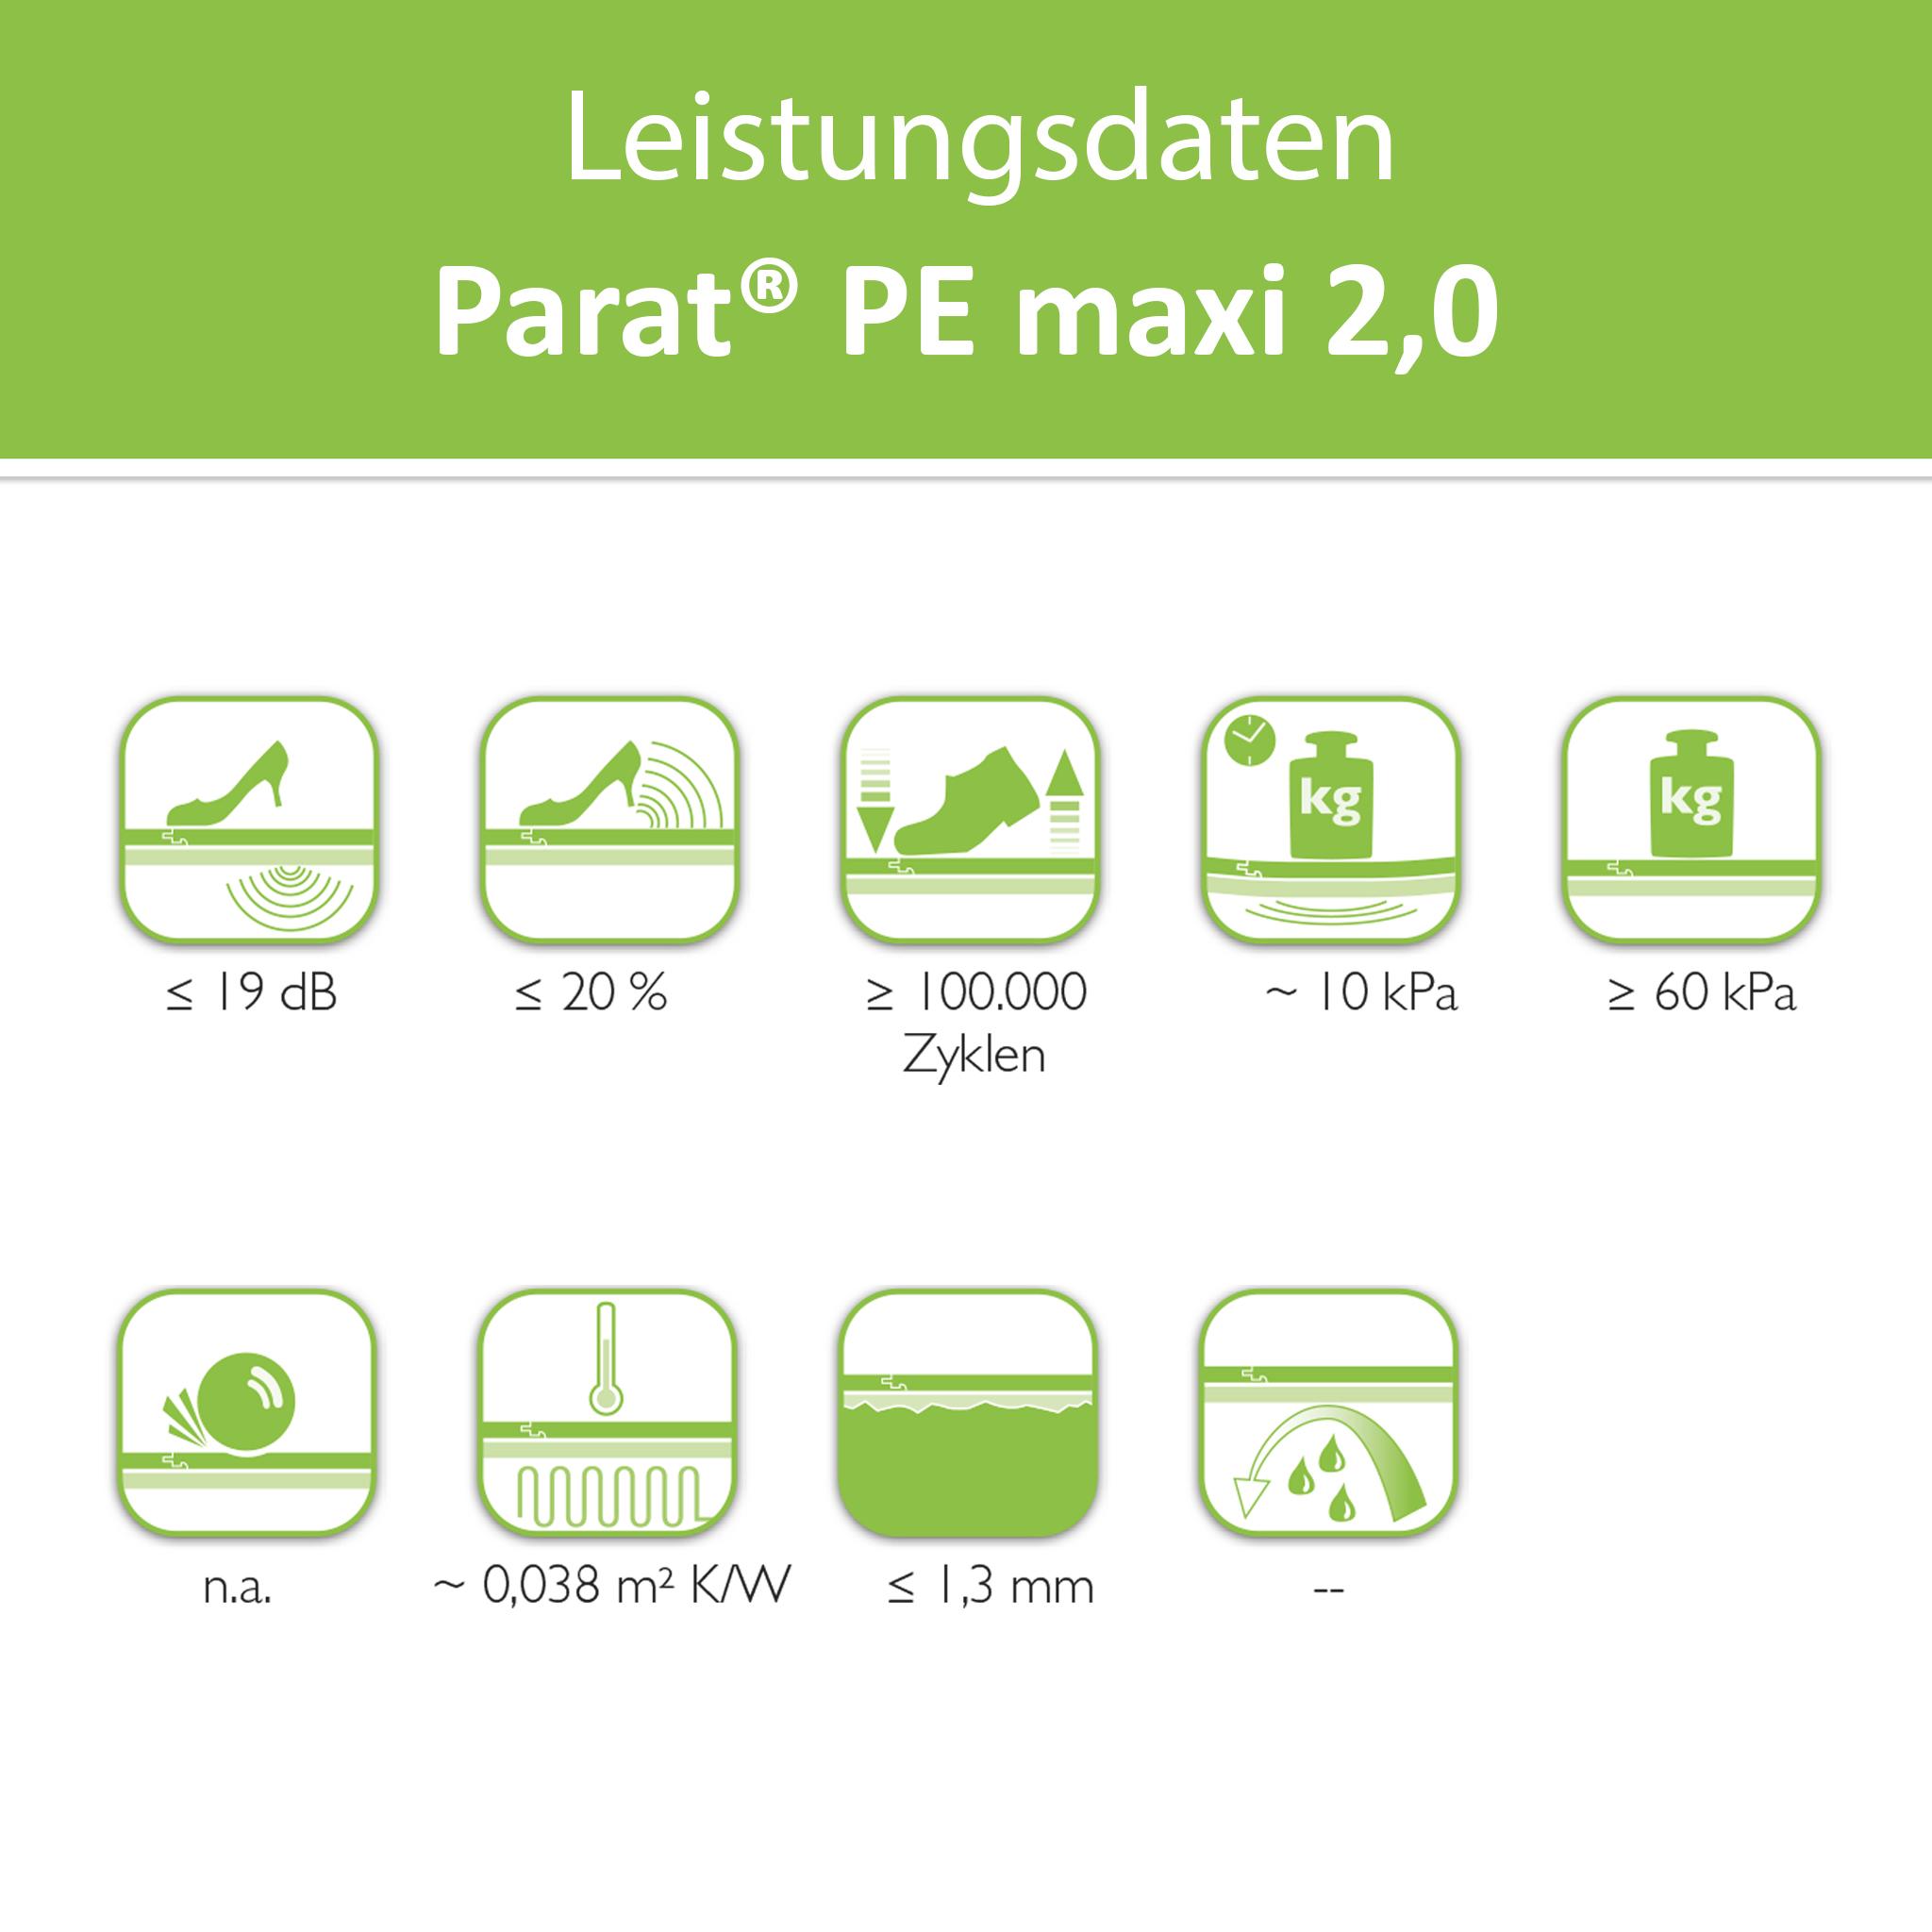 PARAT PE maxi 2,0